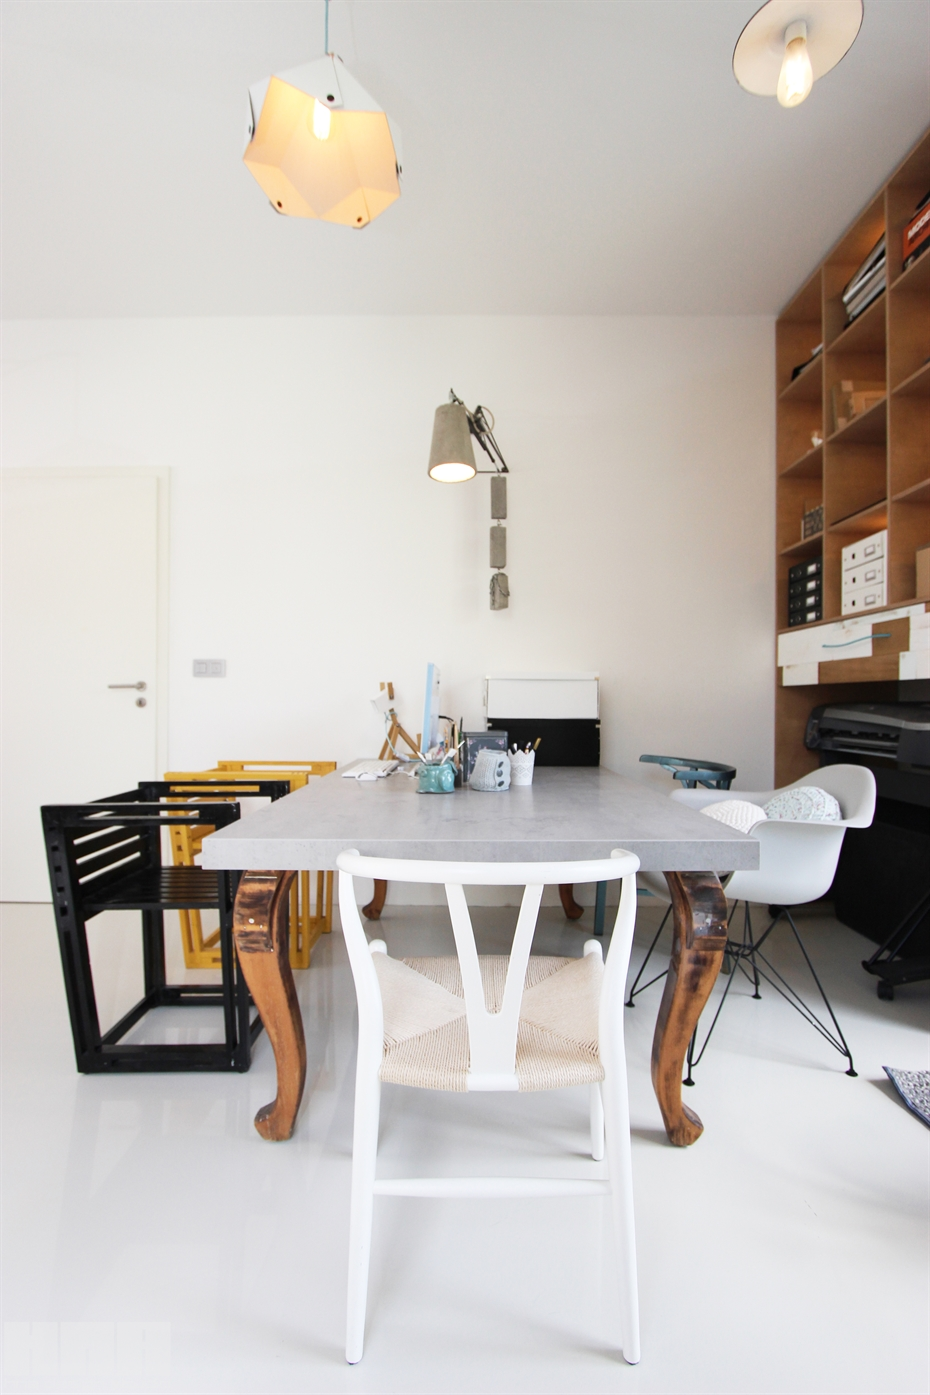 hna design studio iroda 21